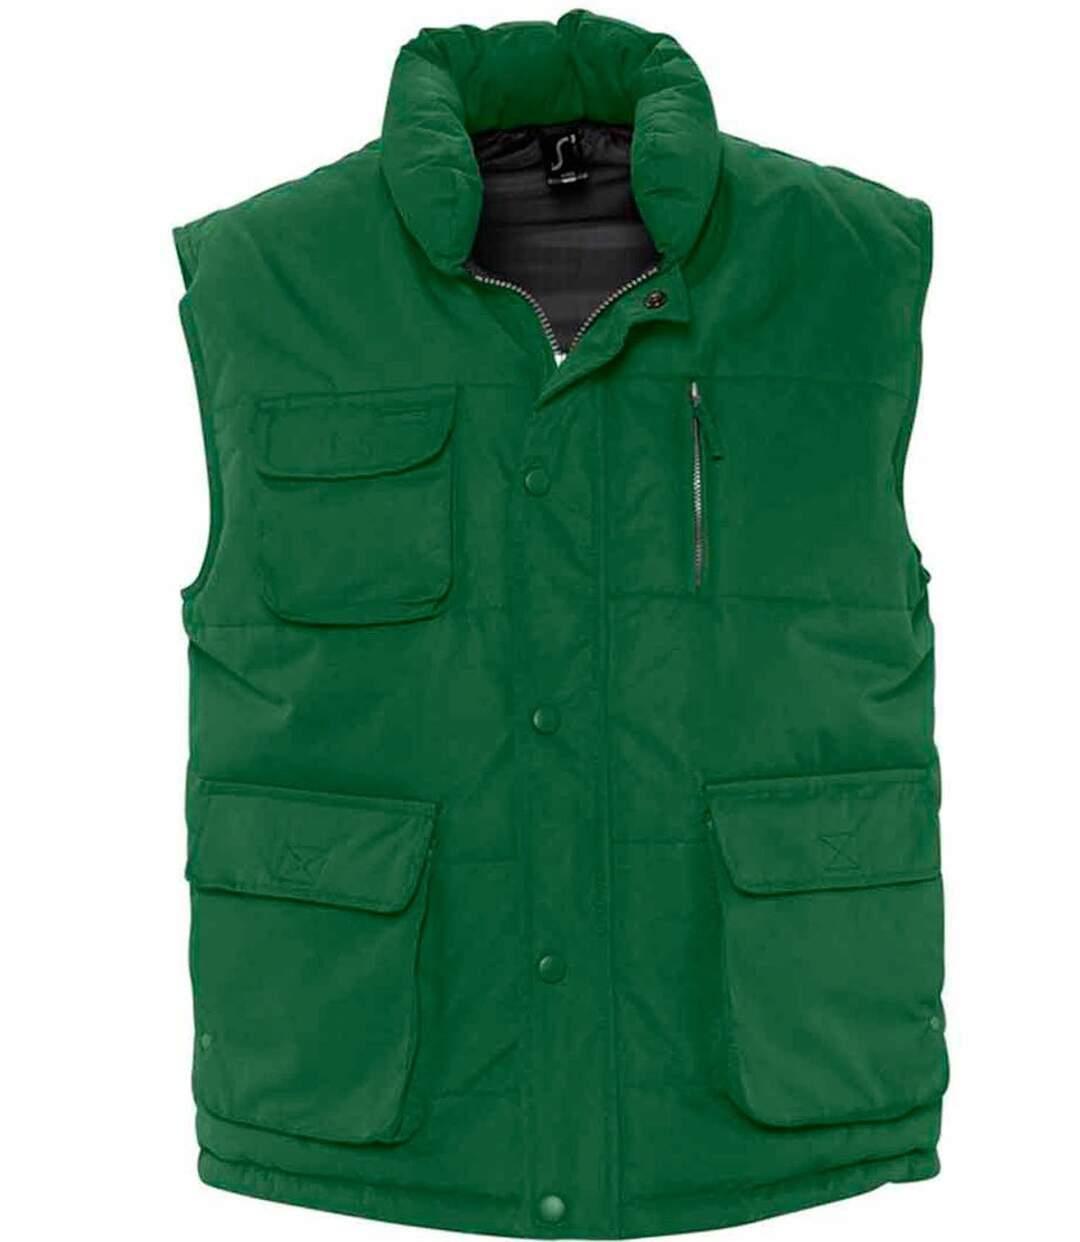 Blouson sans manches unisexe - Bodywarmer - 59000 - vert sapin